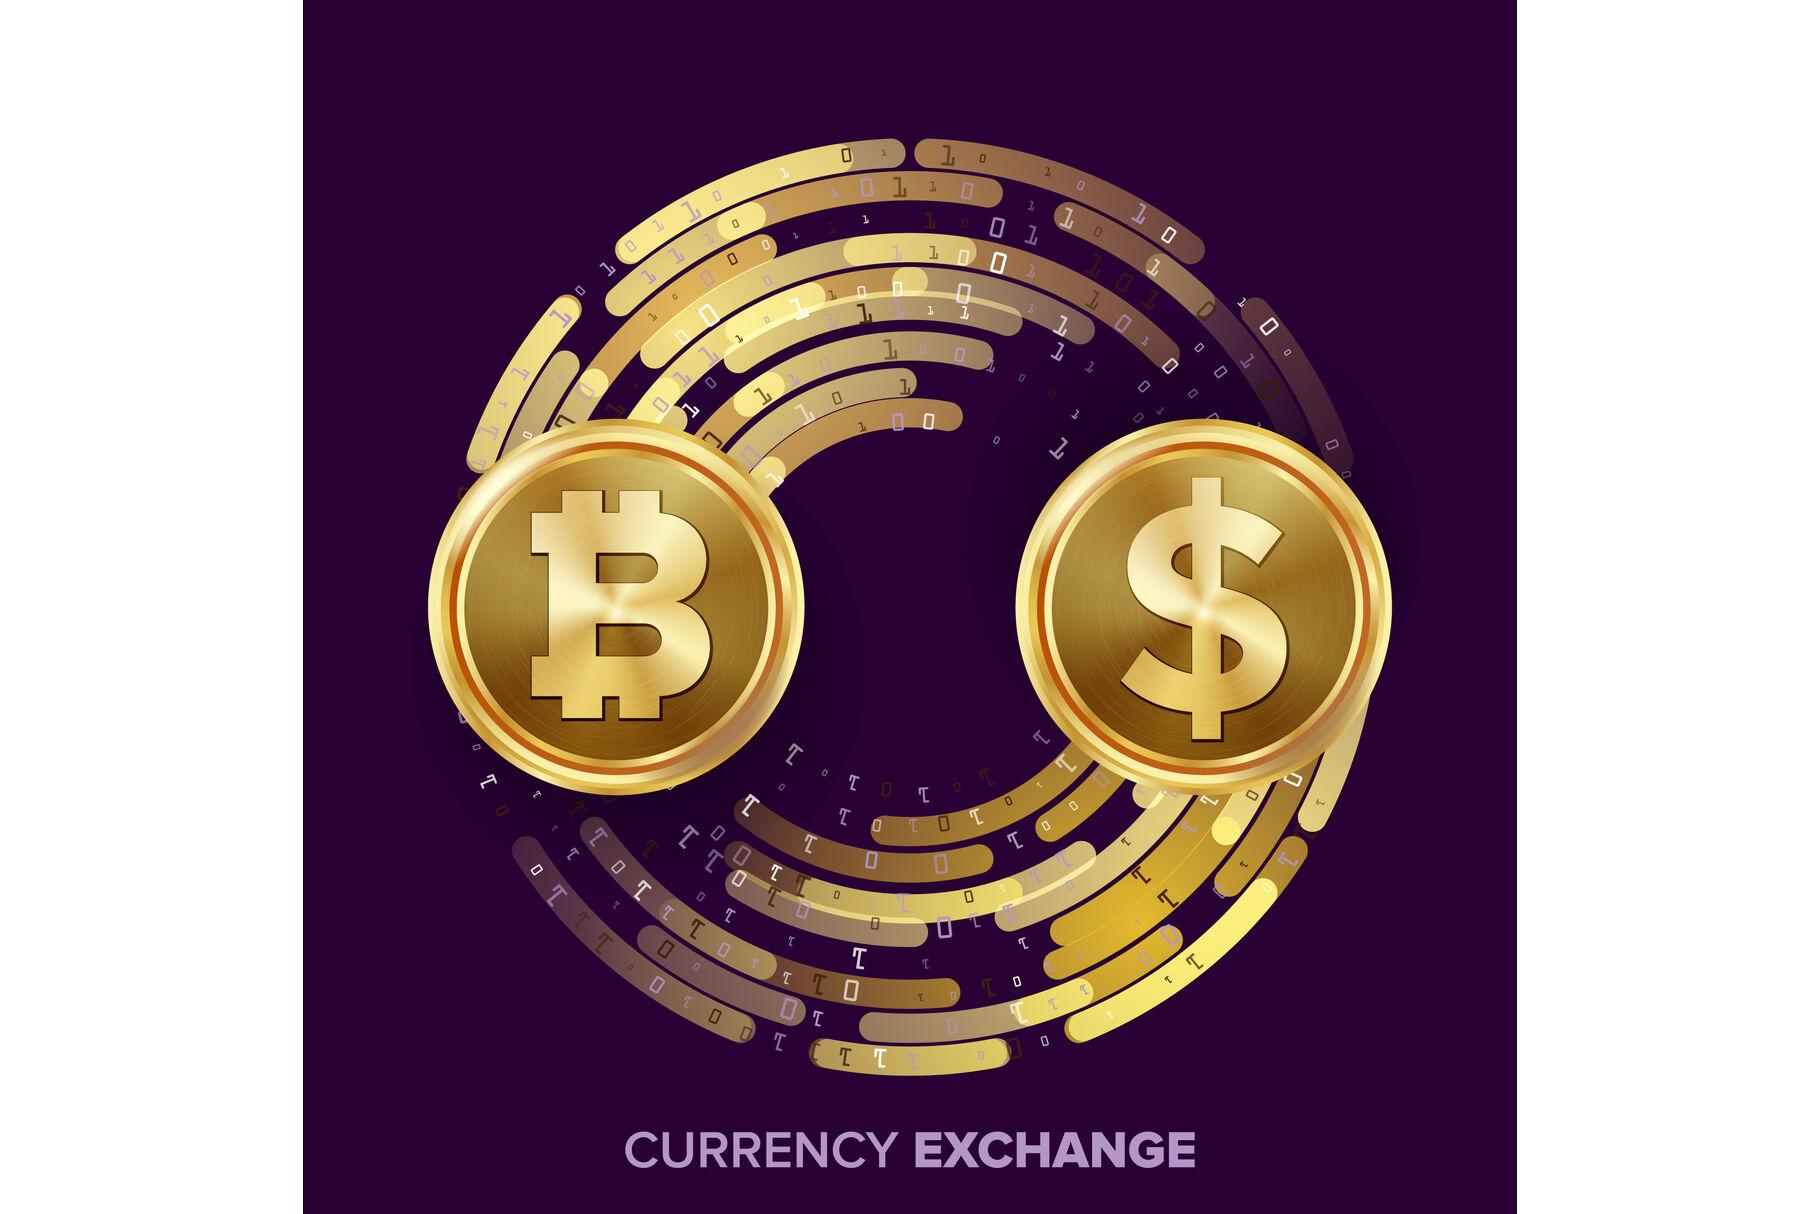 bitcoin tradingview index bitcoin zar